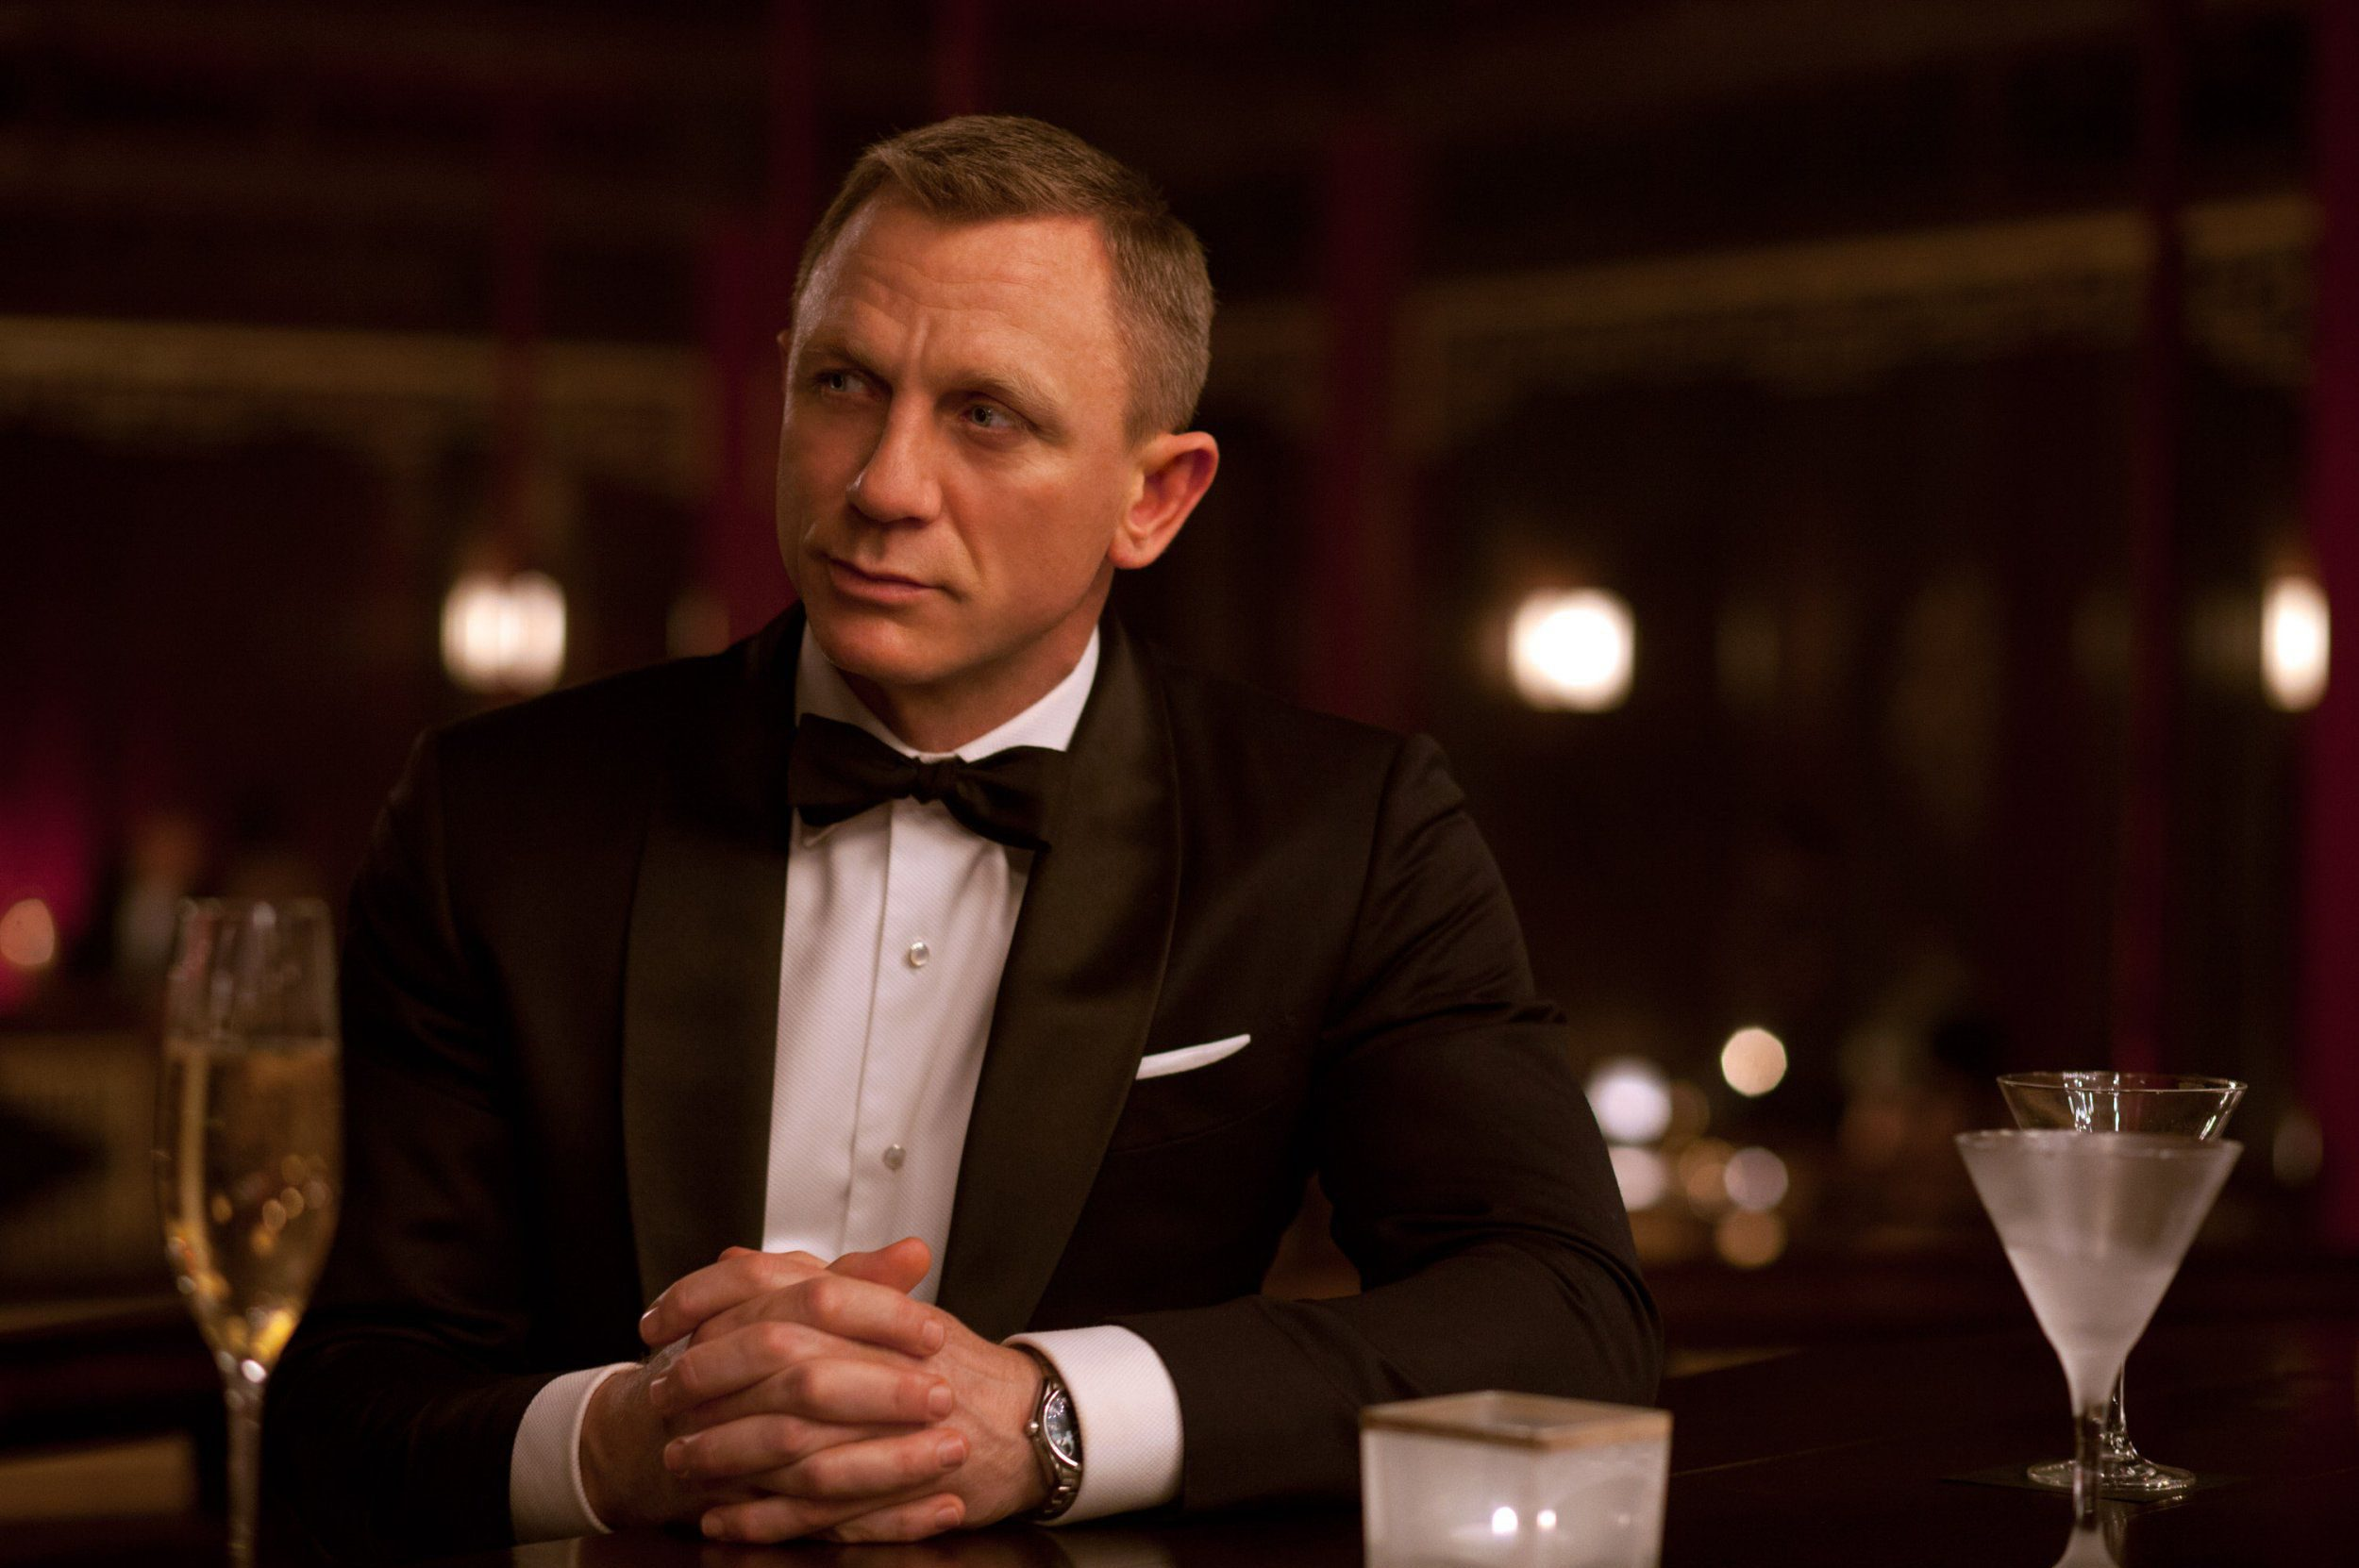 No Merchandising. Editorial Use Only. No Book Cover Usage Mandatory Credit: Photo by Col Pics/Everett/REX/Shutterstock (1966623c) SKYFALL, Daniel Craig as James Bond Skyfall - 2012